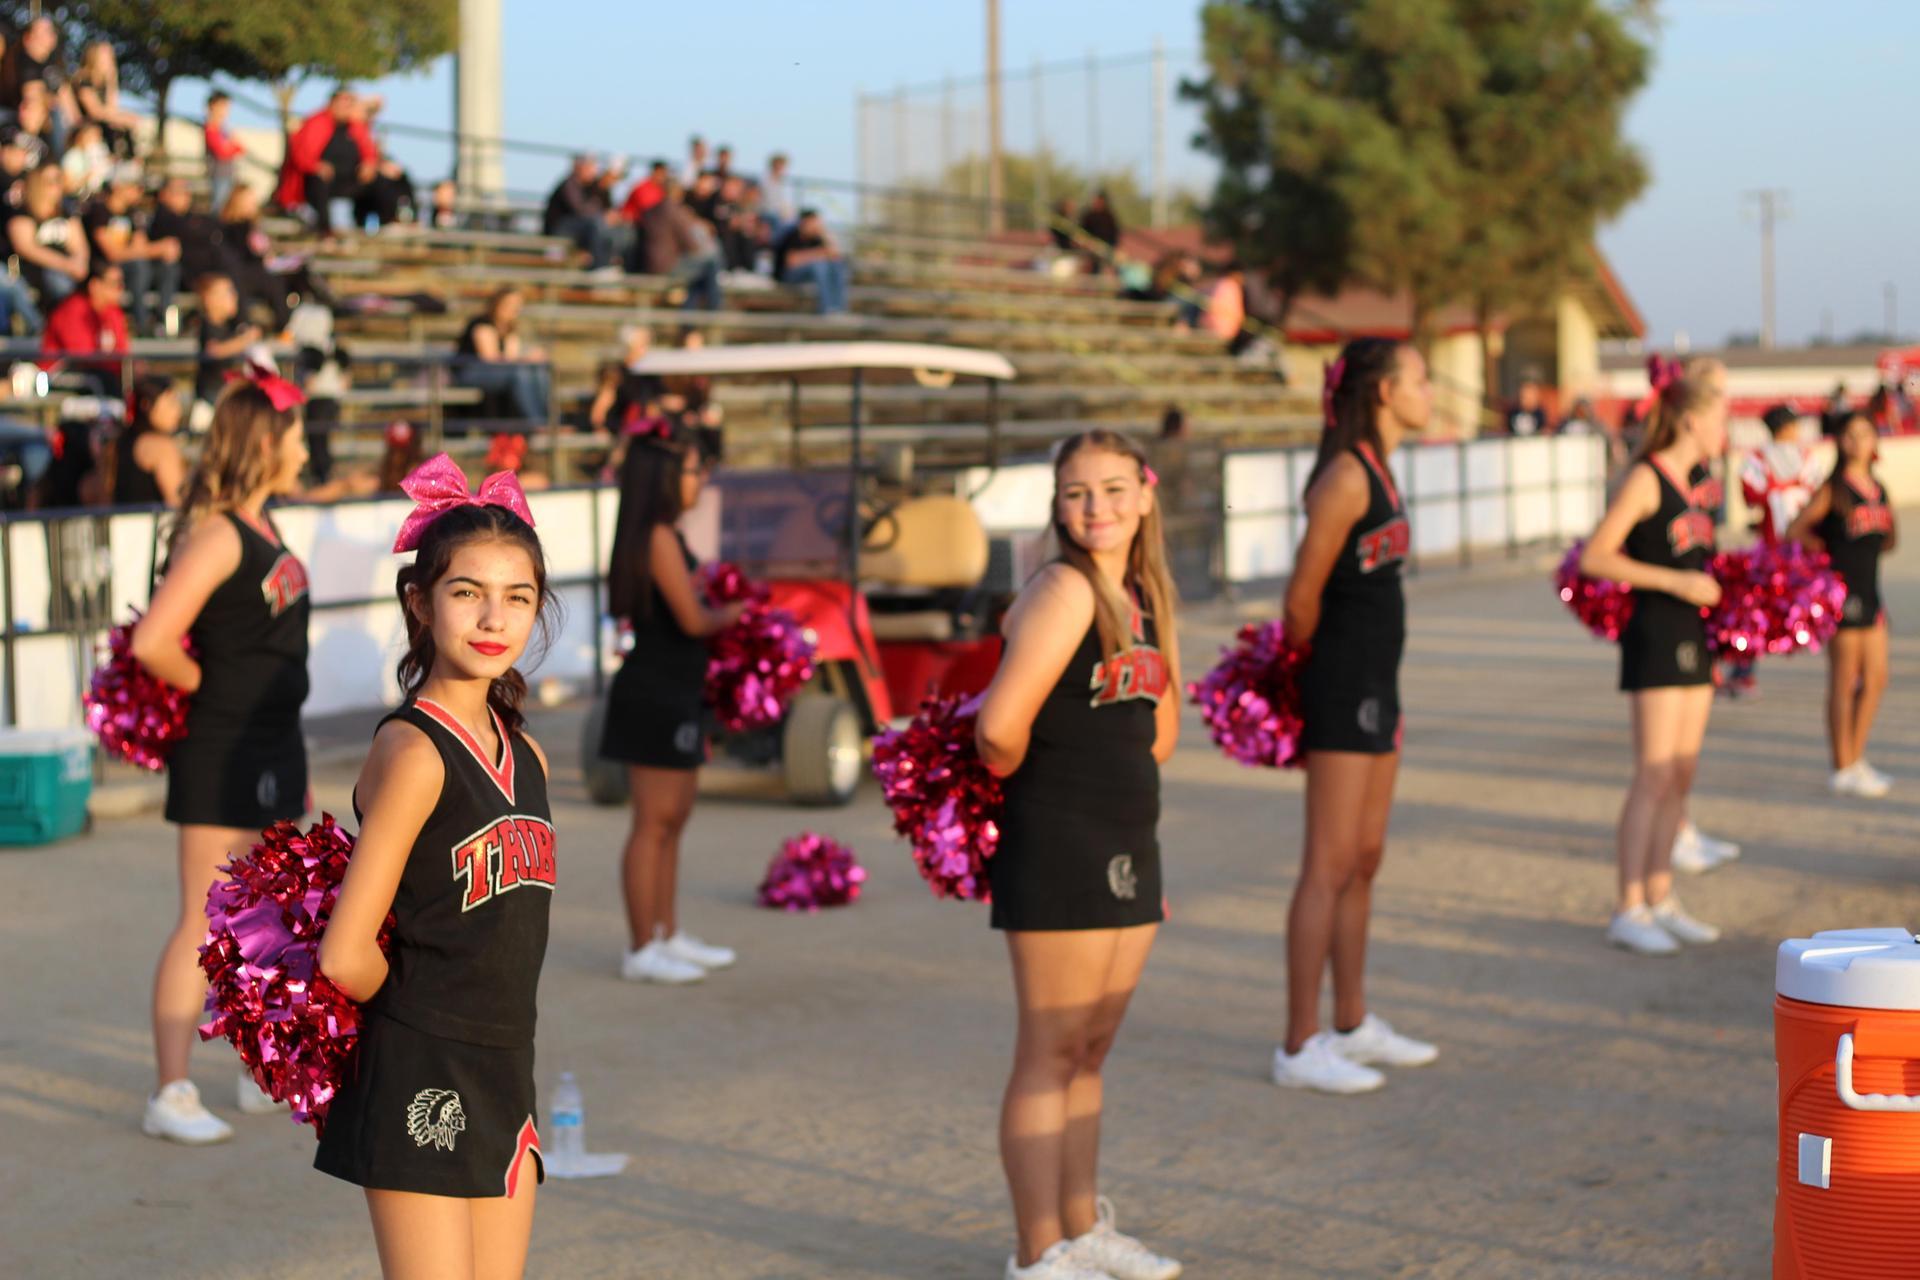 Tribe Cheerleaders Watching the Football Game